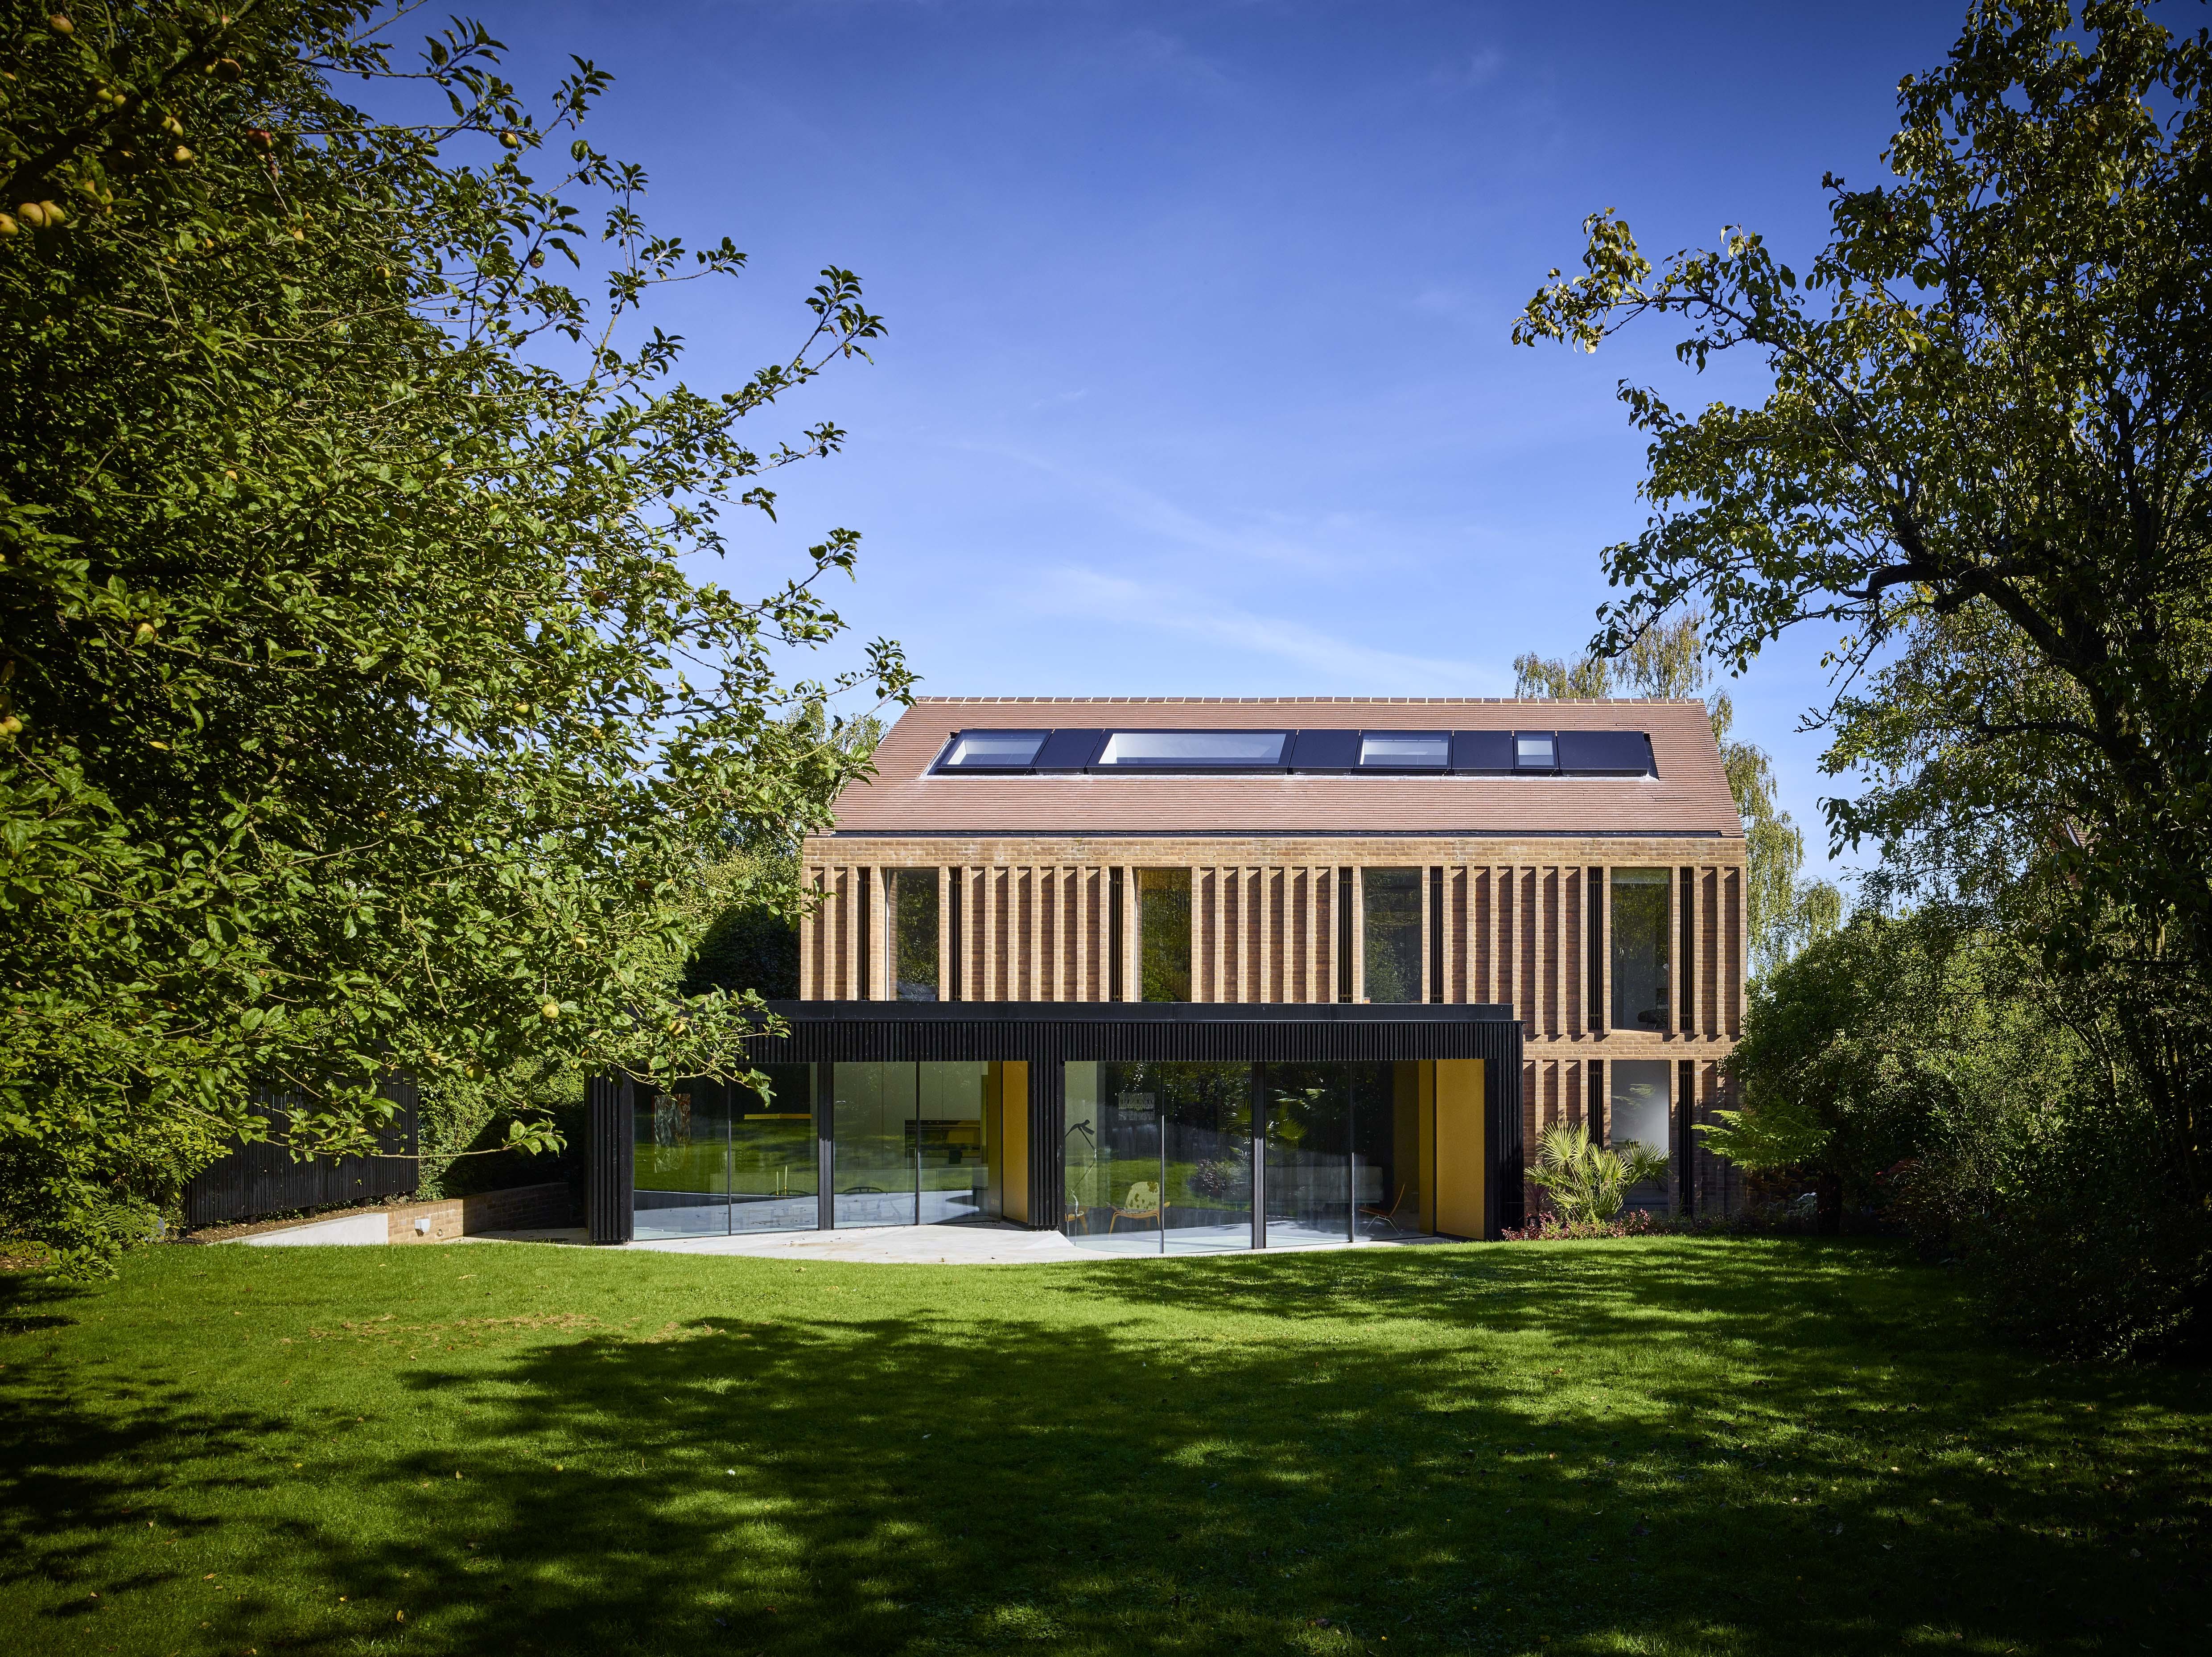 Modern Detached by Coffey Architects won the RIBA East Award 2017